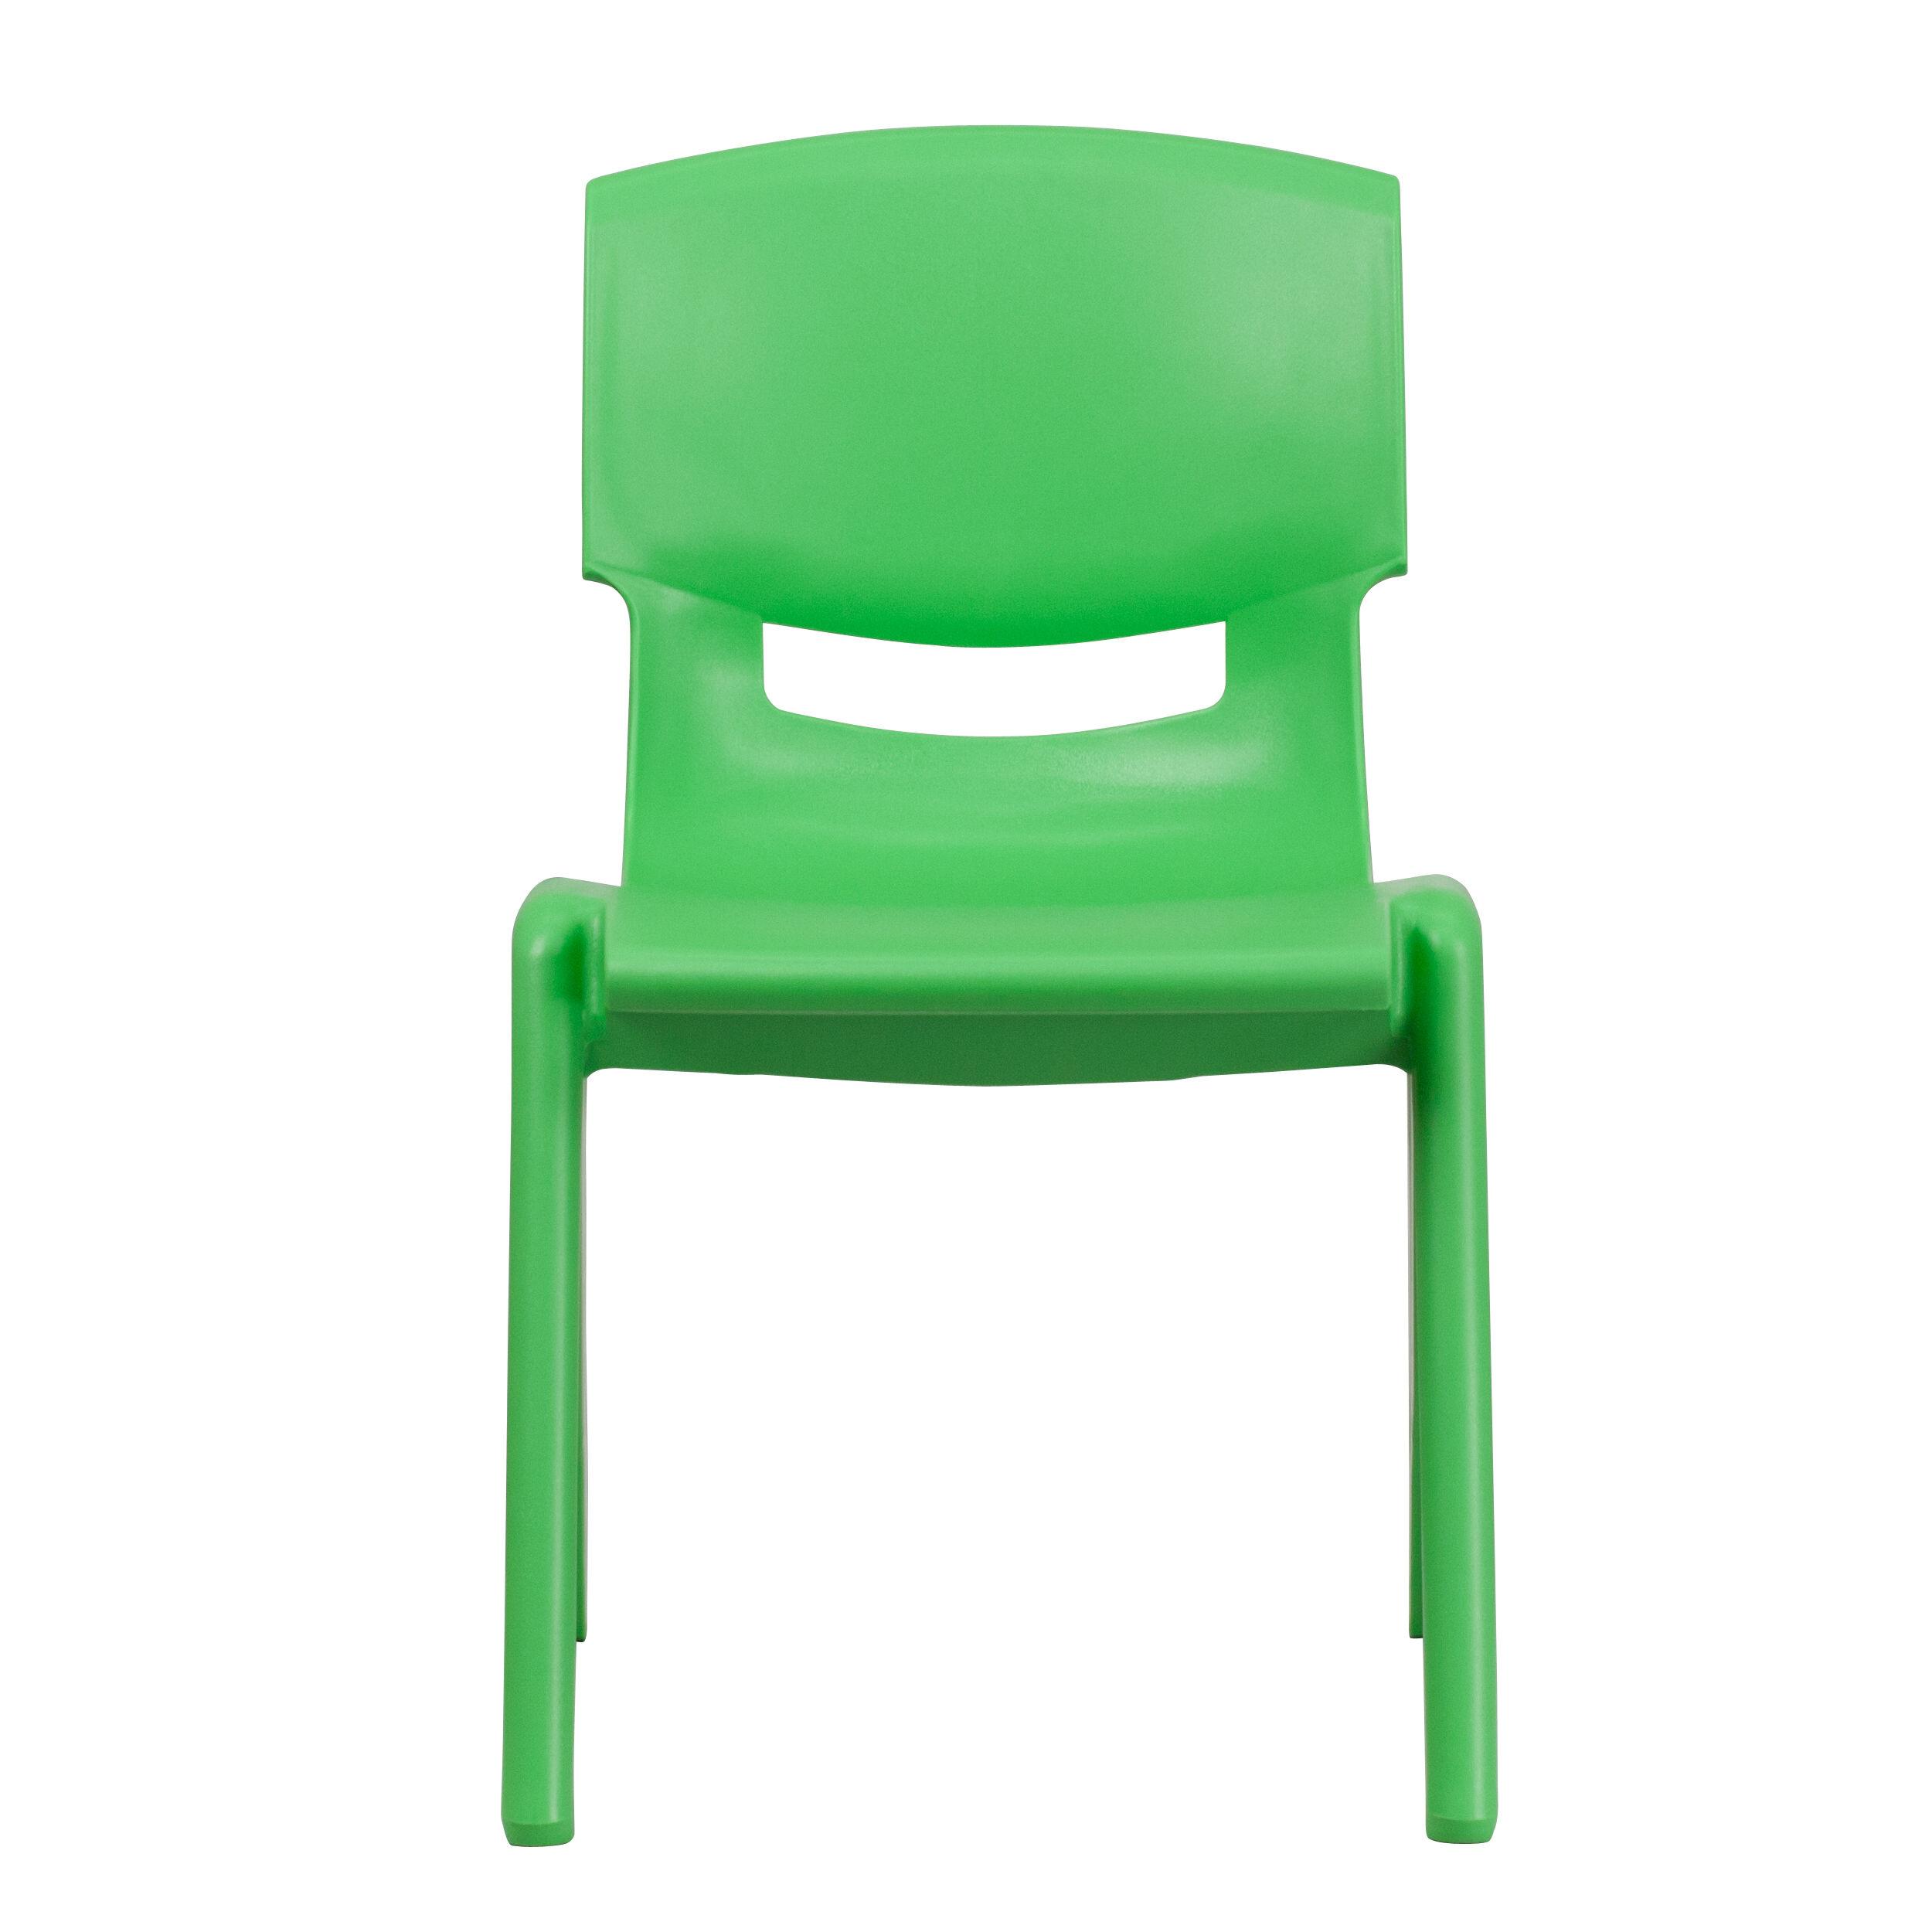 biz chair com burke tulip green plastic stack yu ycx 005 gg bizchair